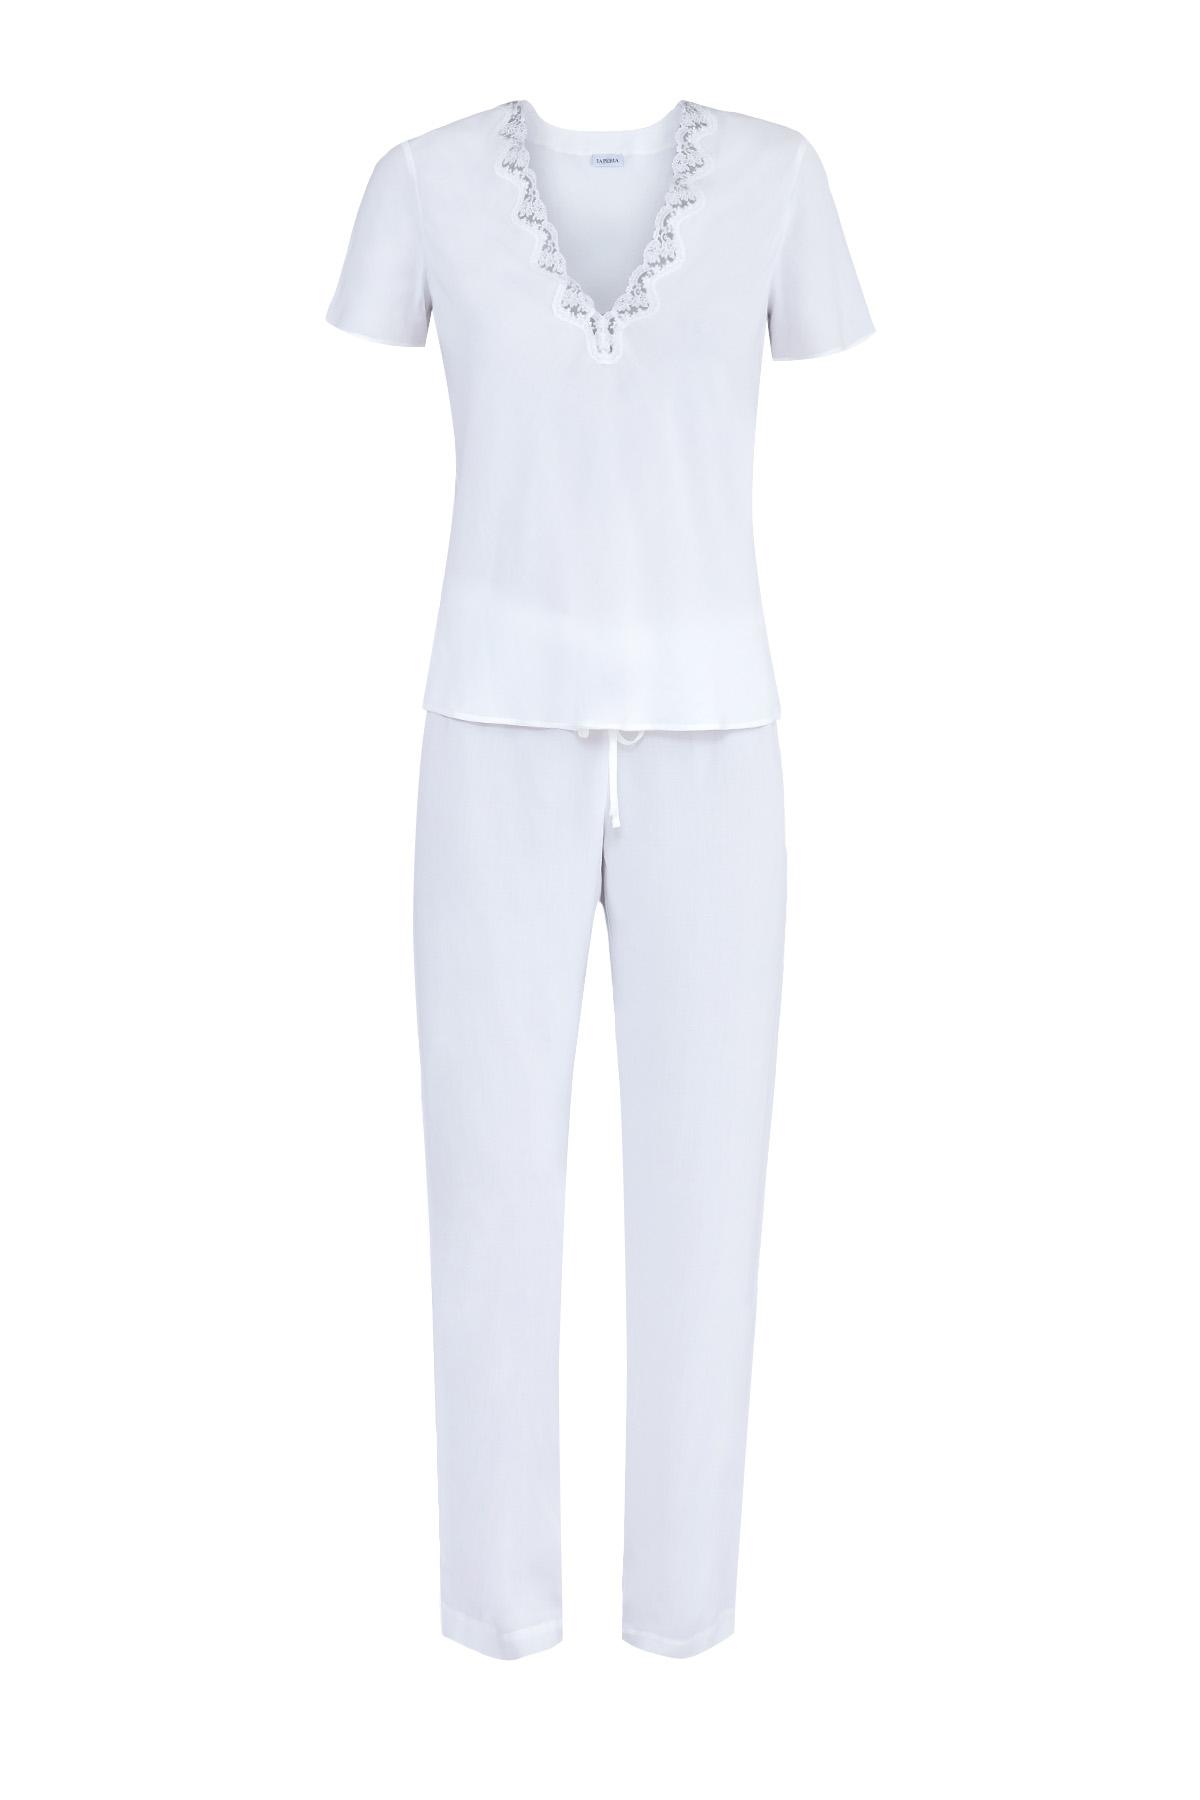 пижама LA PERLA 22949 0001